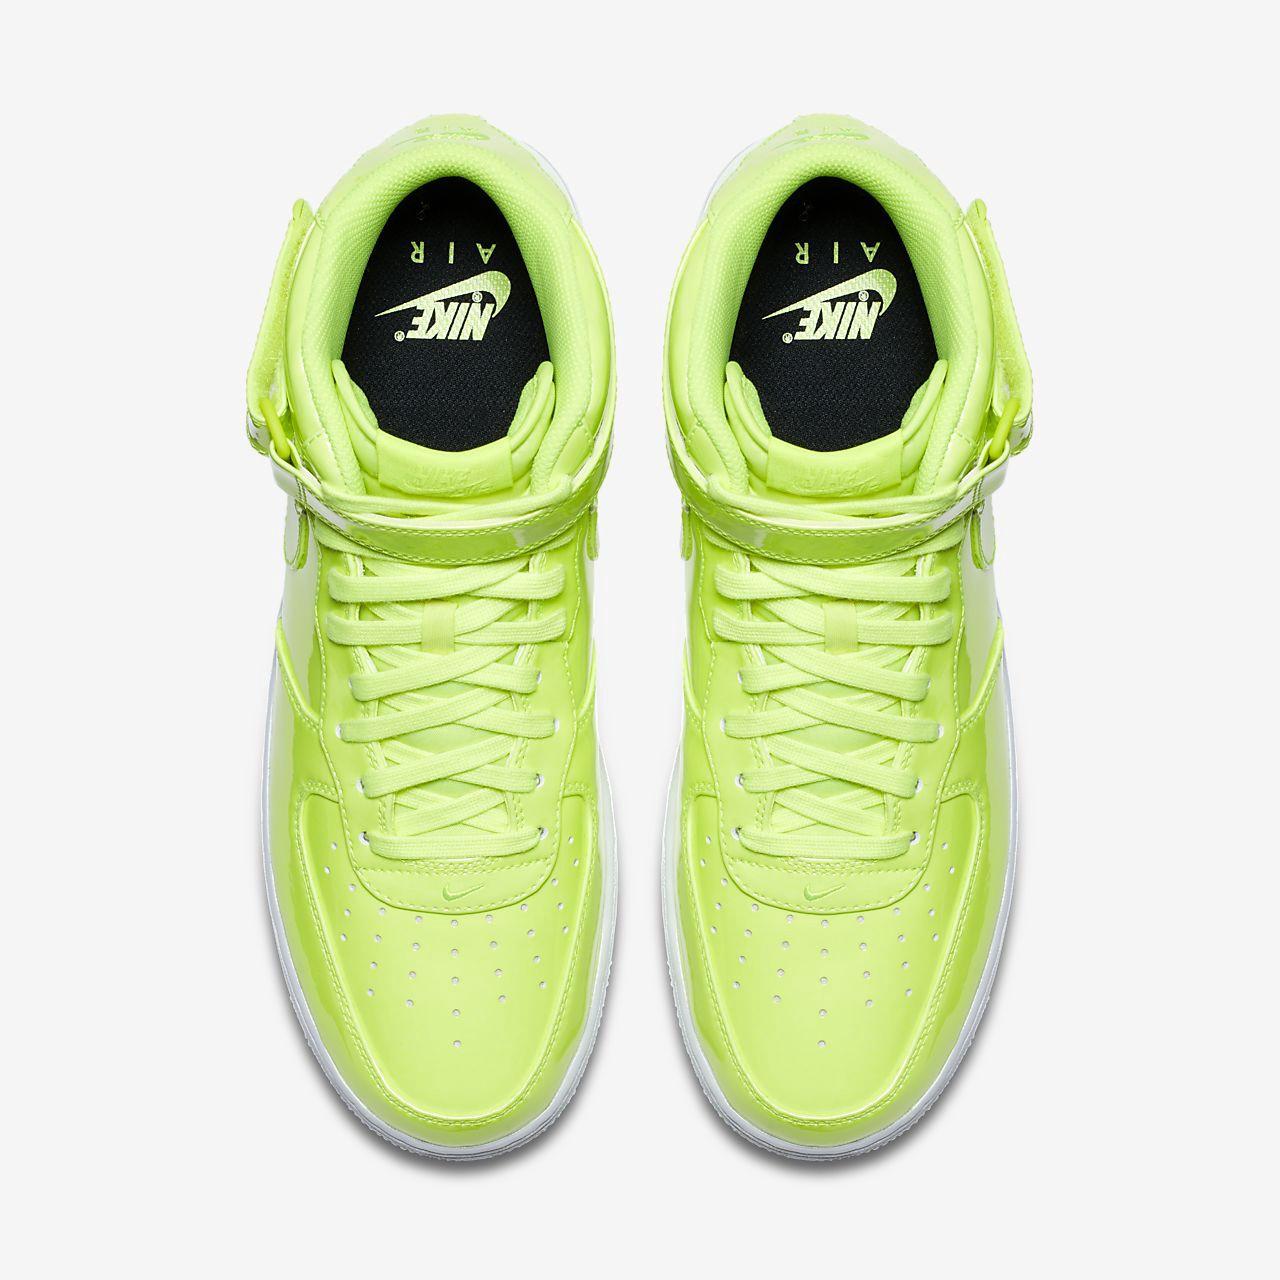 hot sale online 0f2d0 247e1 Nike Air Force 1 Mid 07 Lv8 Uv Mens Shoe - 10.5 Air Force 1